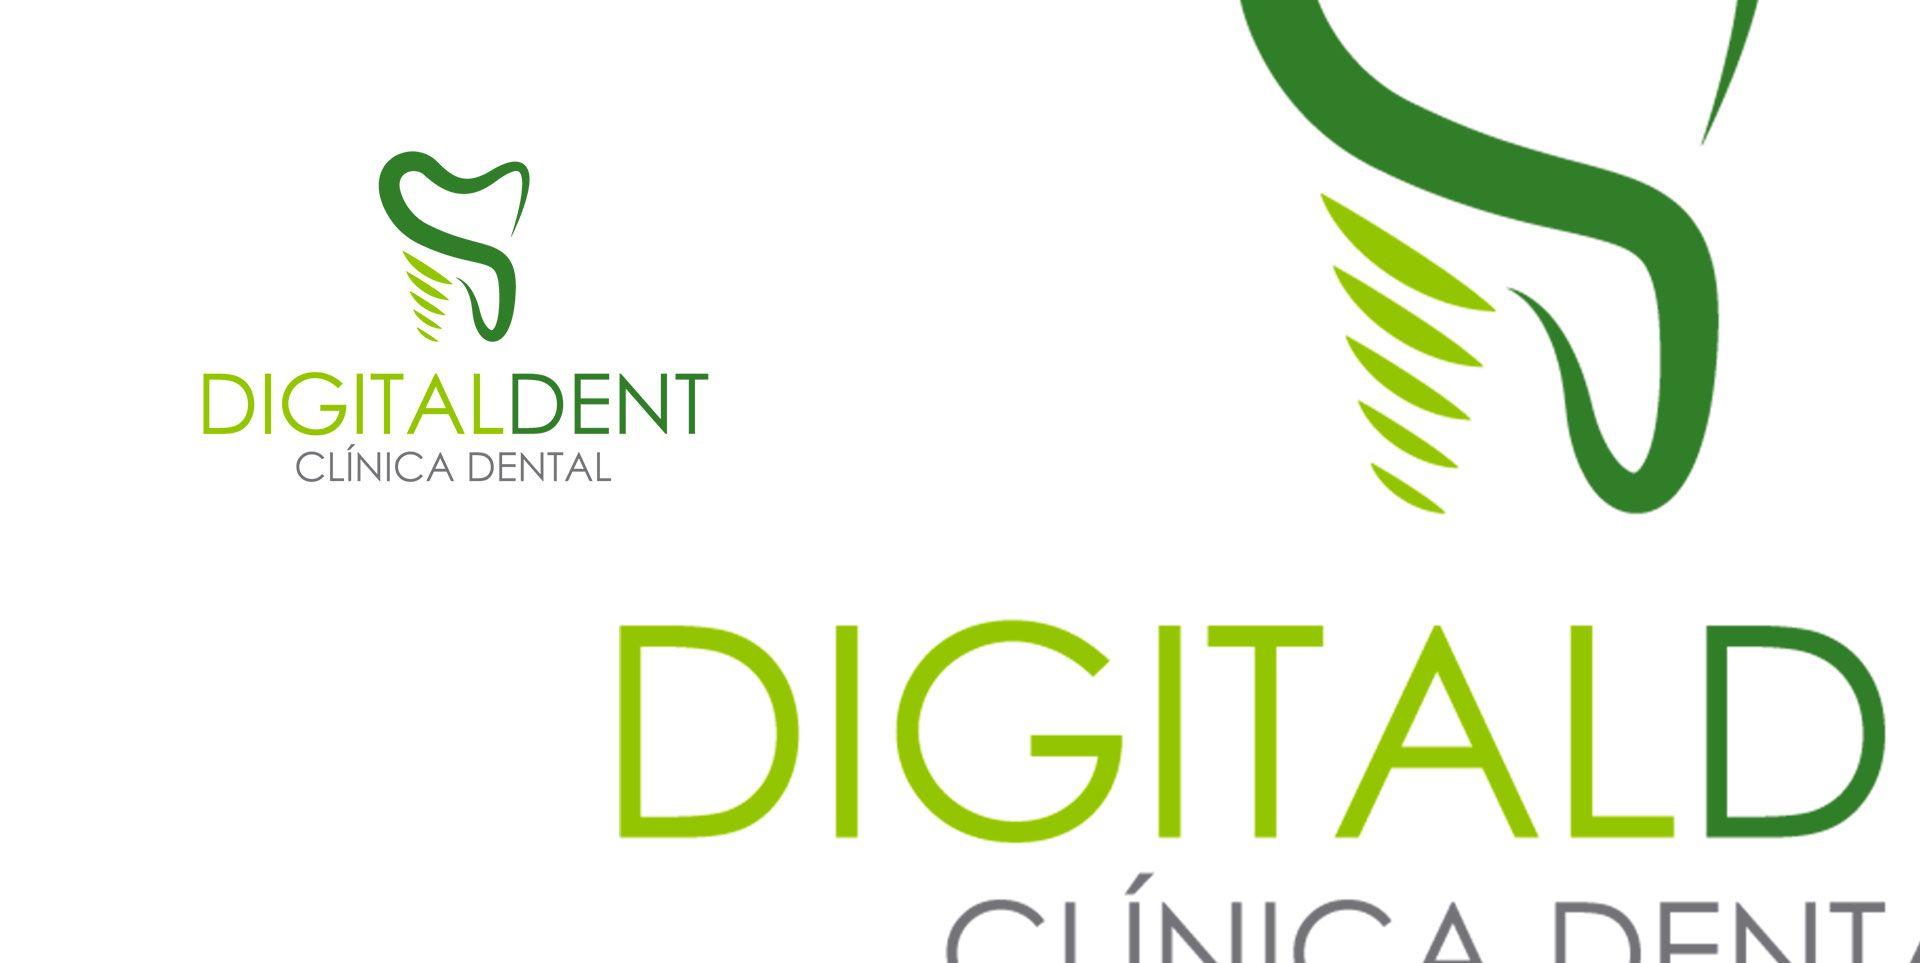 digitaldent-marca-001